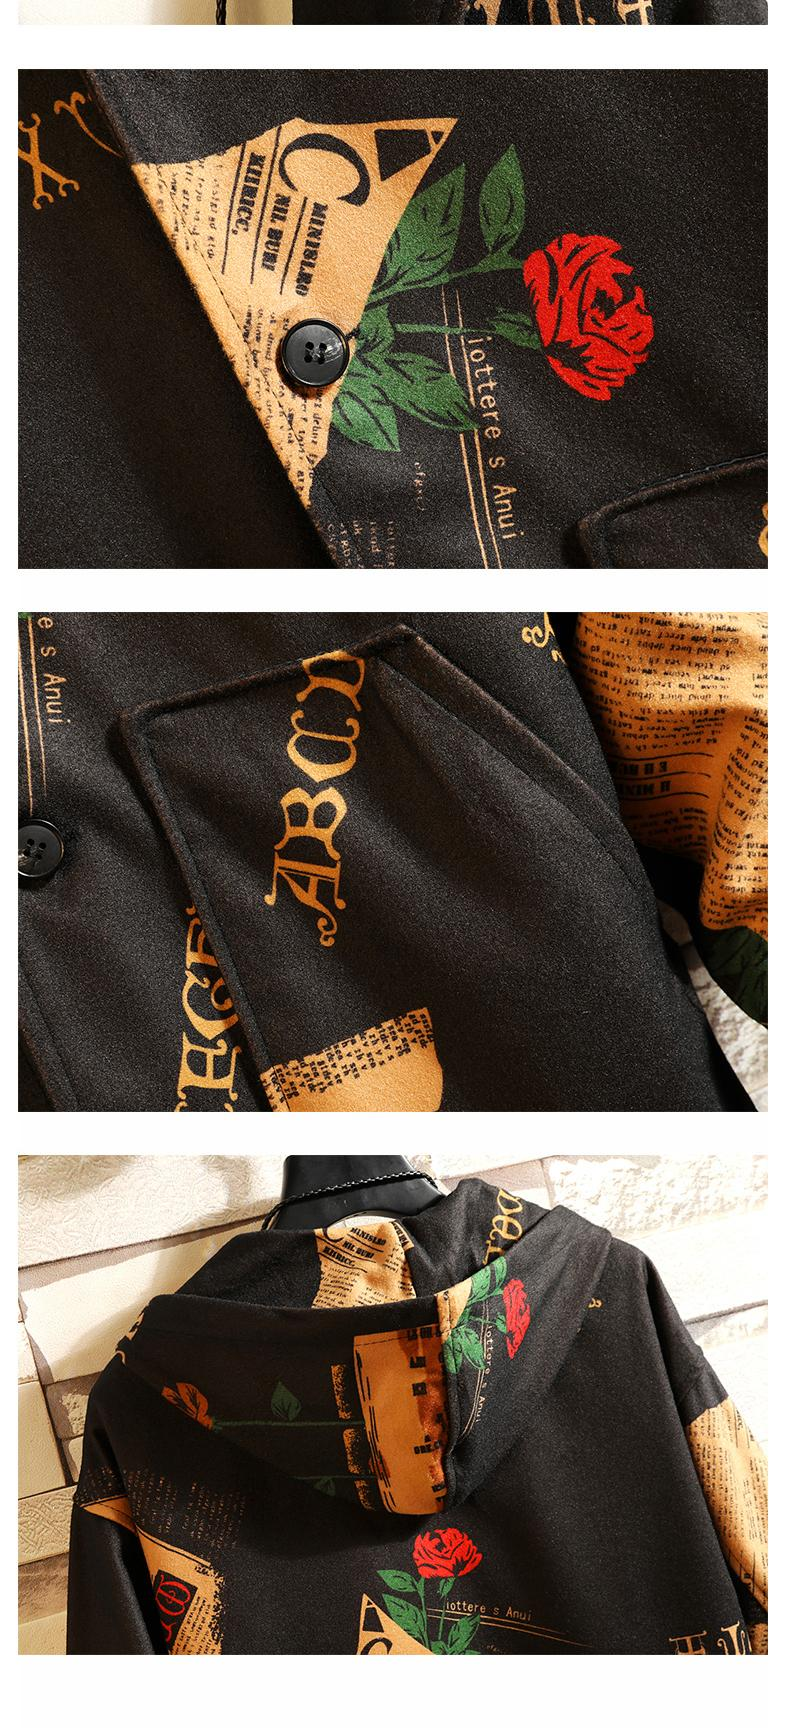 HTB1ezVjXh2rK1RkSnhJq6ykdpXay Privathinker INS Hooded Bomber Jackets Men 2019 Mens Streetwear Funny Print Windbreaker Male Korean Fashion Autumn Jackets Coats